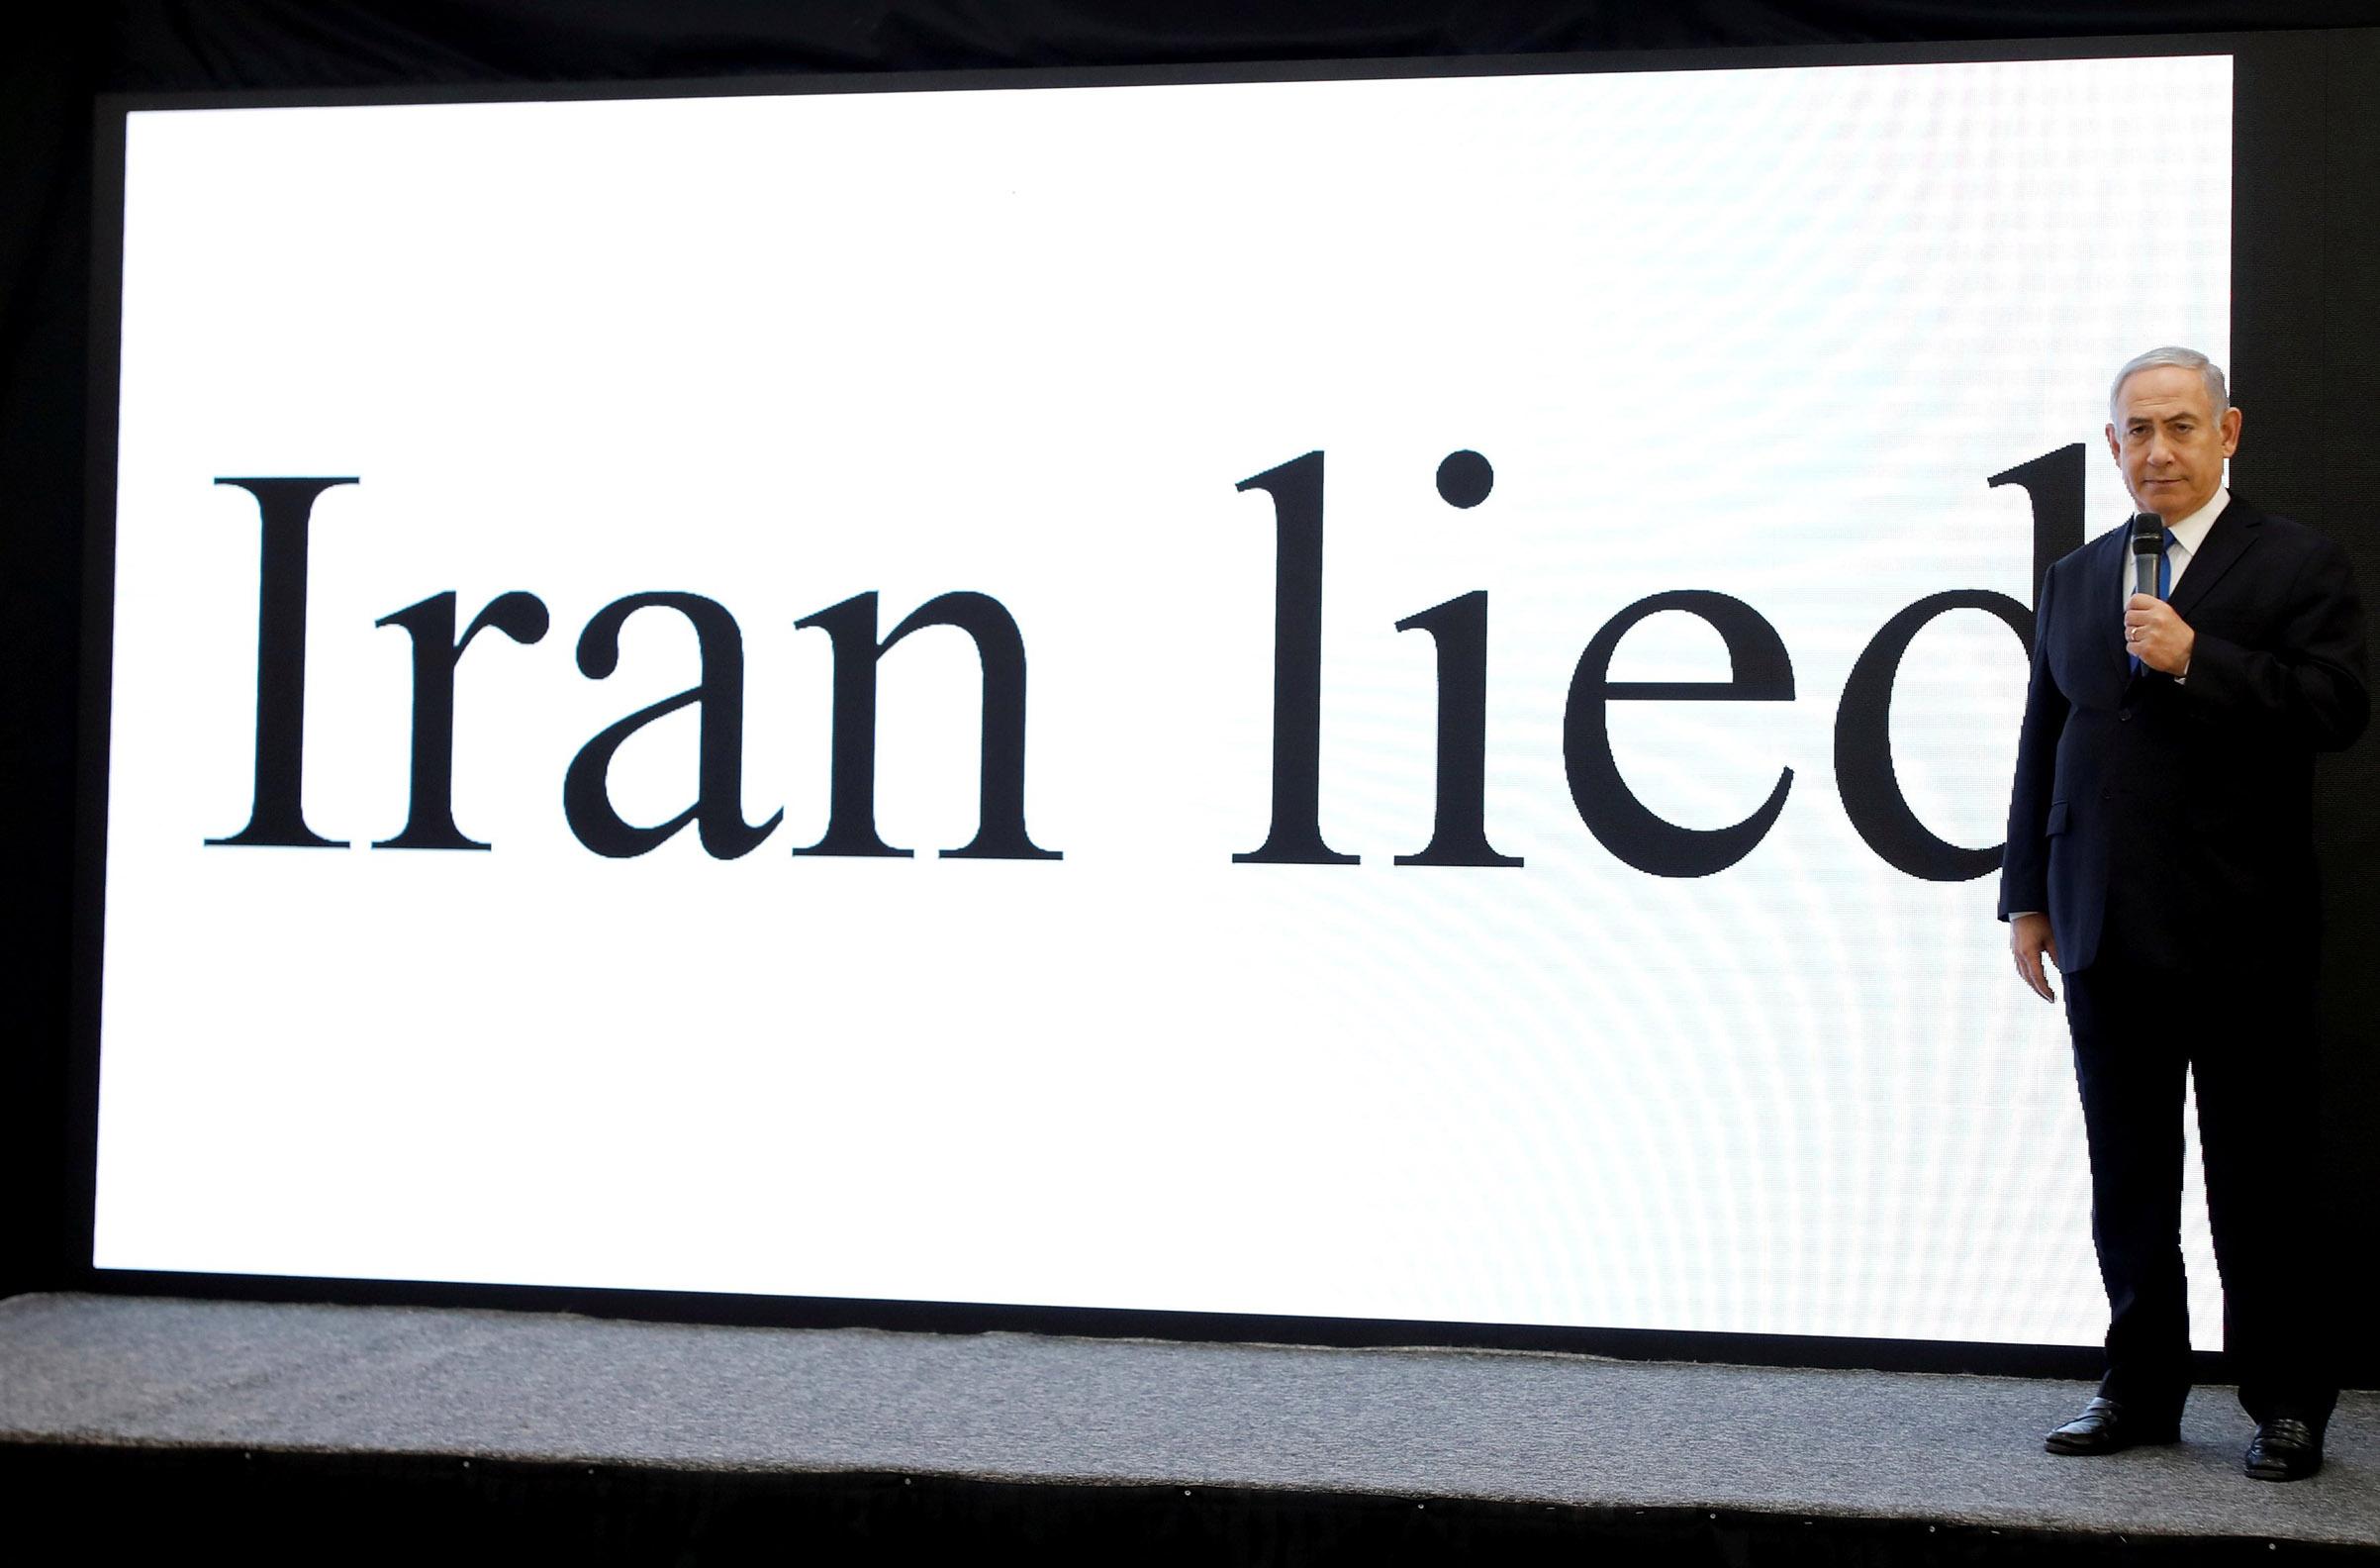 At a presentation in Tel Aviv on April 30, Israeli Prime Minister Benjamin Netanyahu accused Iran of hiding its nuclear program